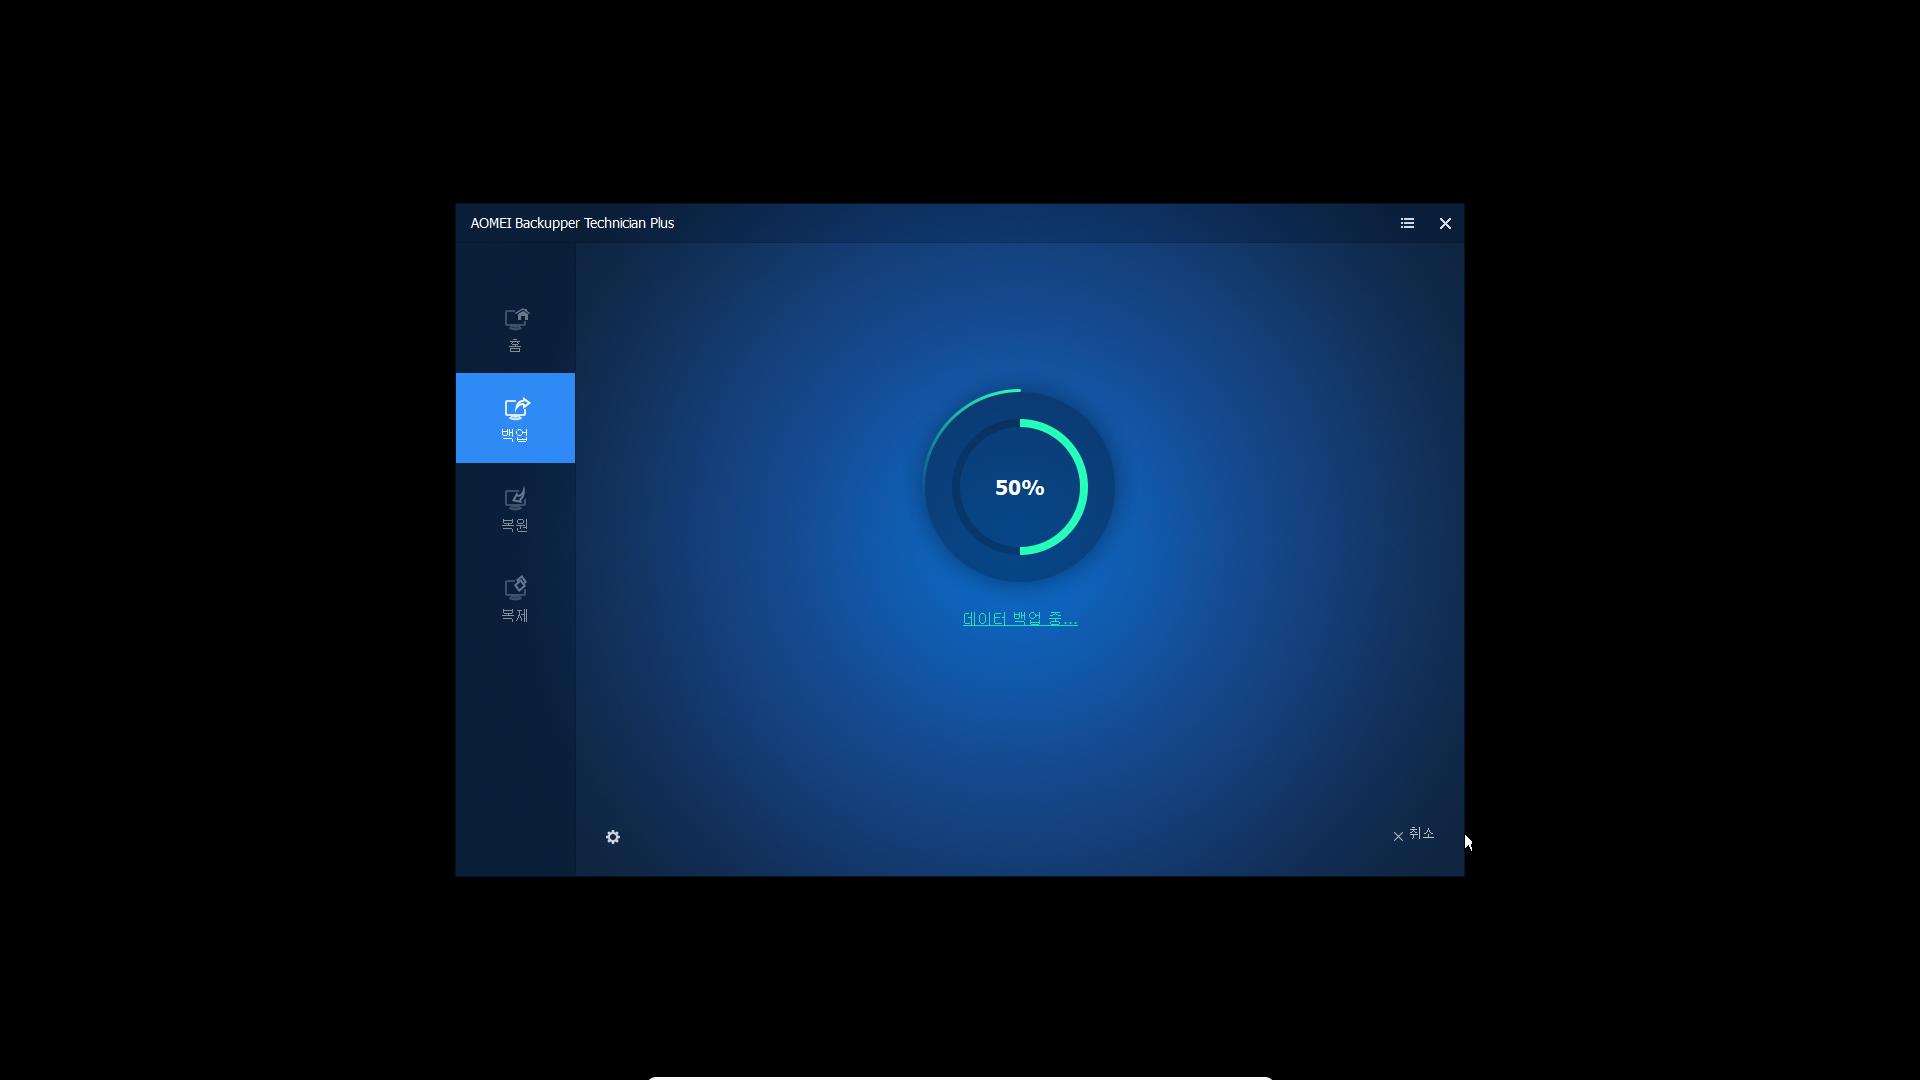 AOMEI Backupper 5.0.0 PE 한글화 후 시스템 백업 복구 테스트 2019-07-07_212700.png